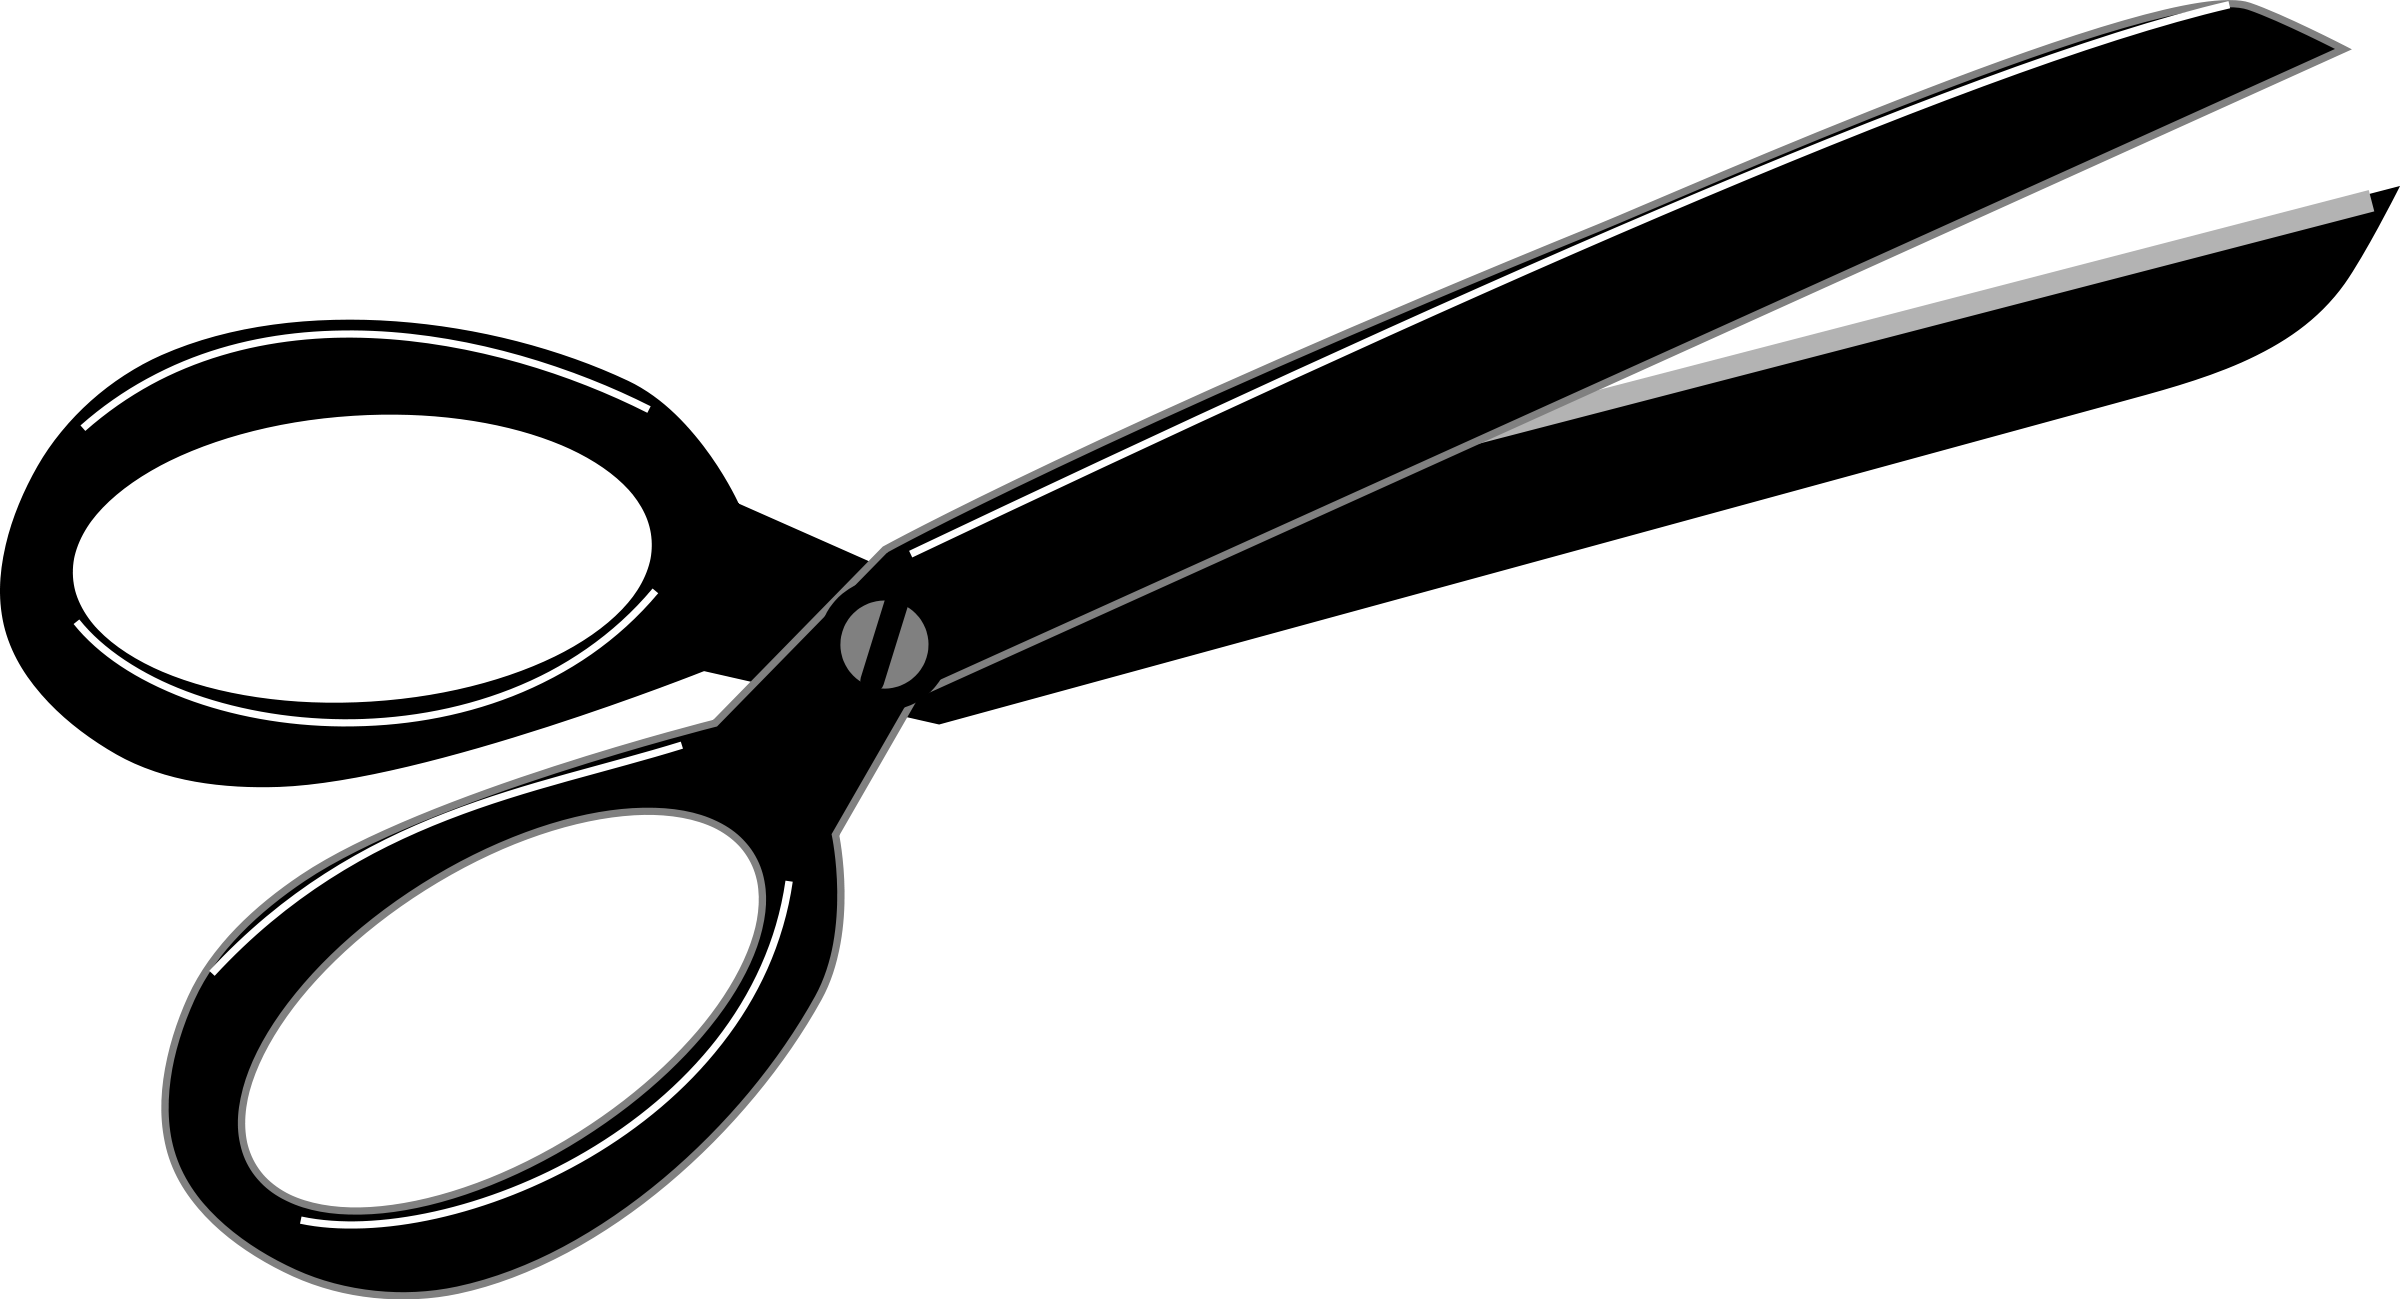 Scissors clipart free images